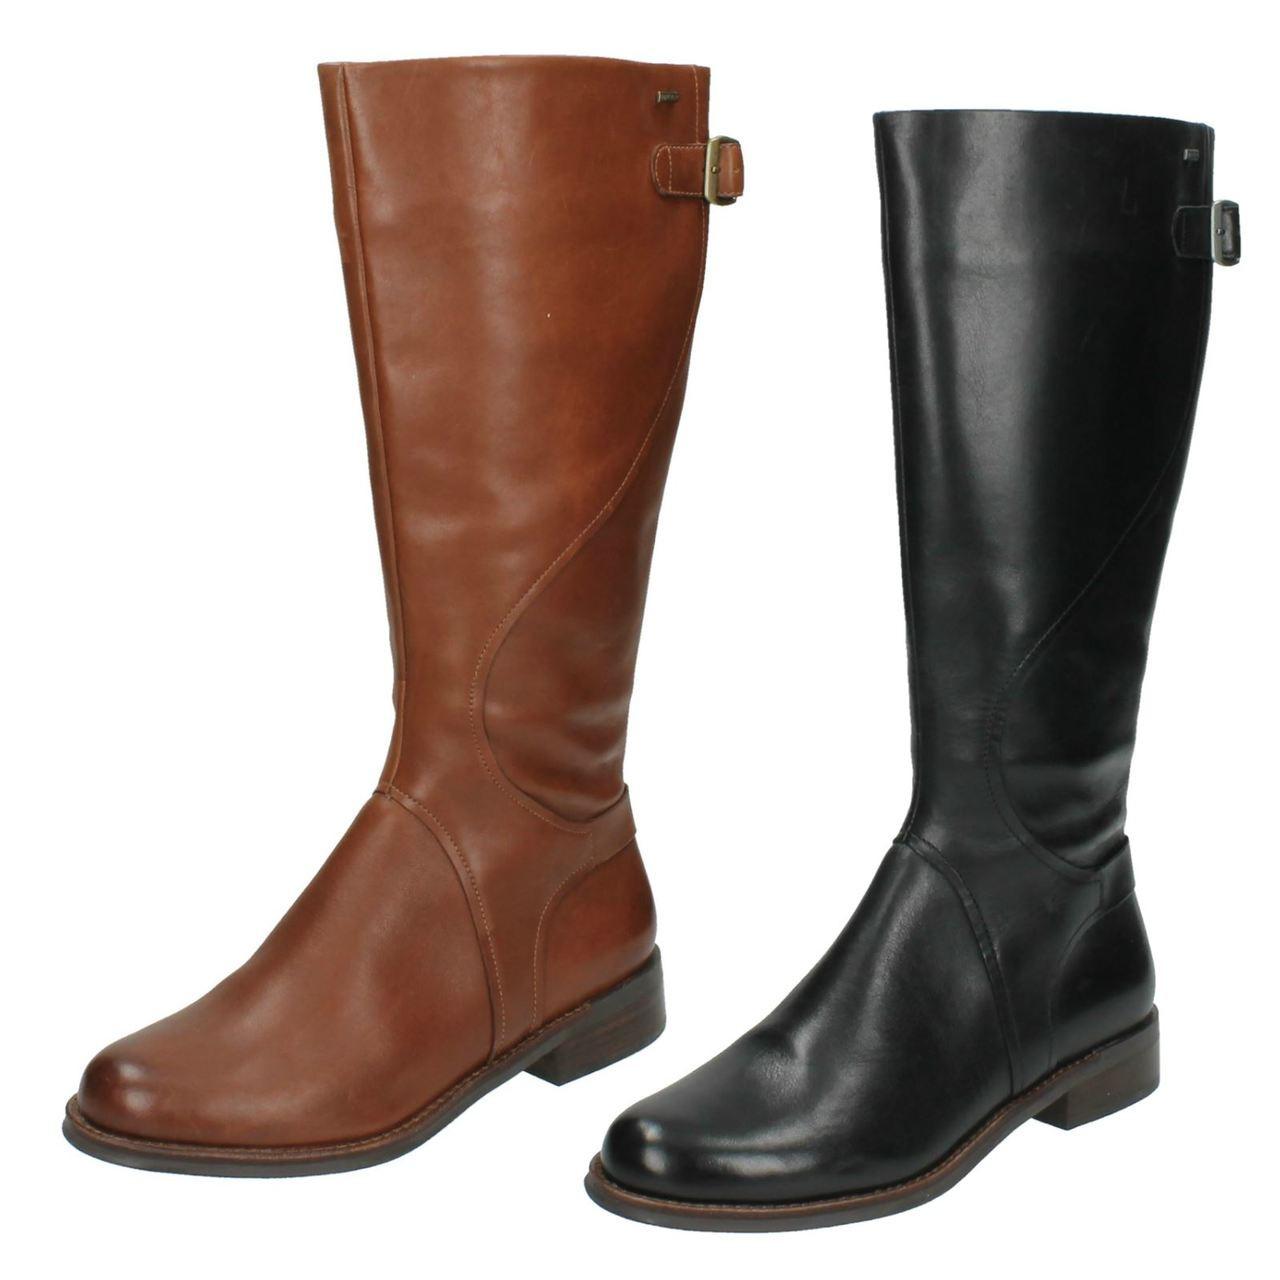 Ladies Clarks Gore-Tex High Leg Boots